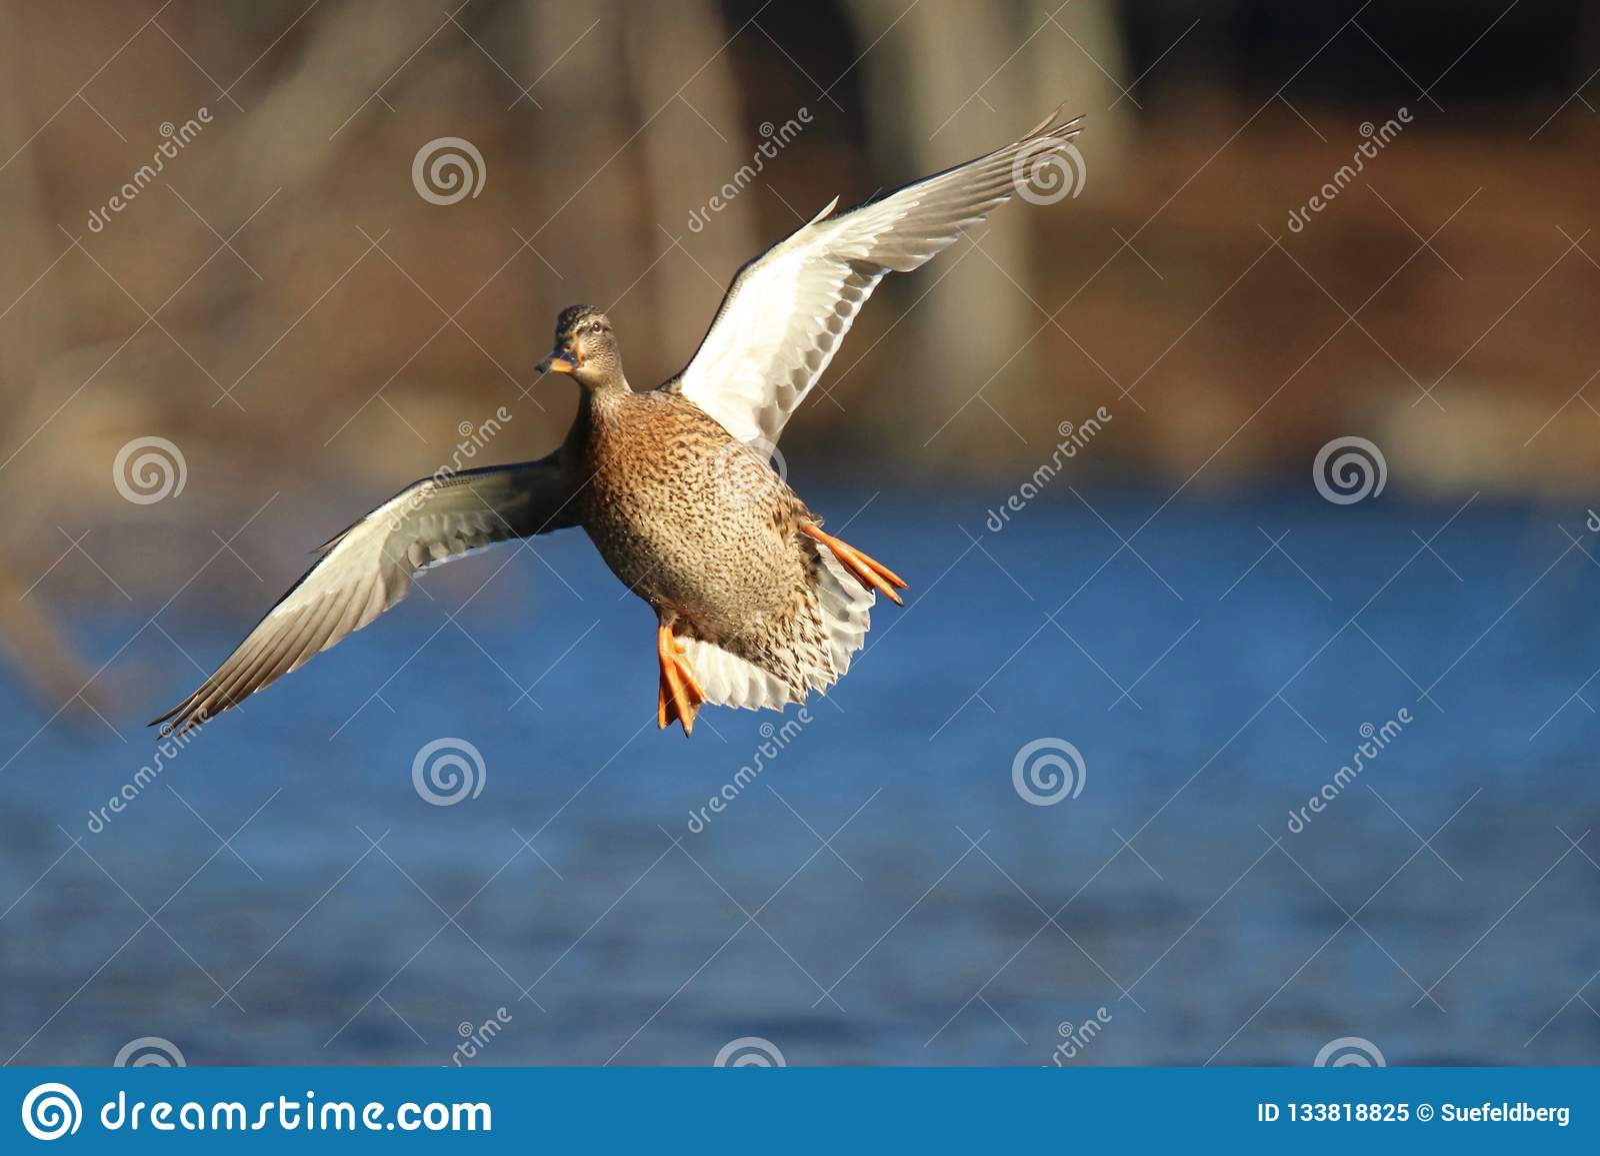 Incoming Mallard Duck in Flight